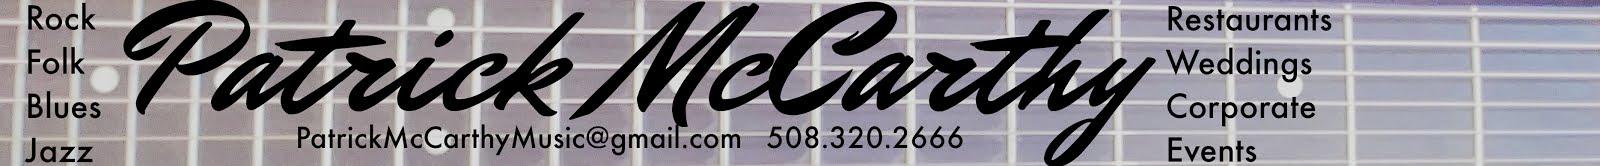 Patrick McCarthy Music